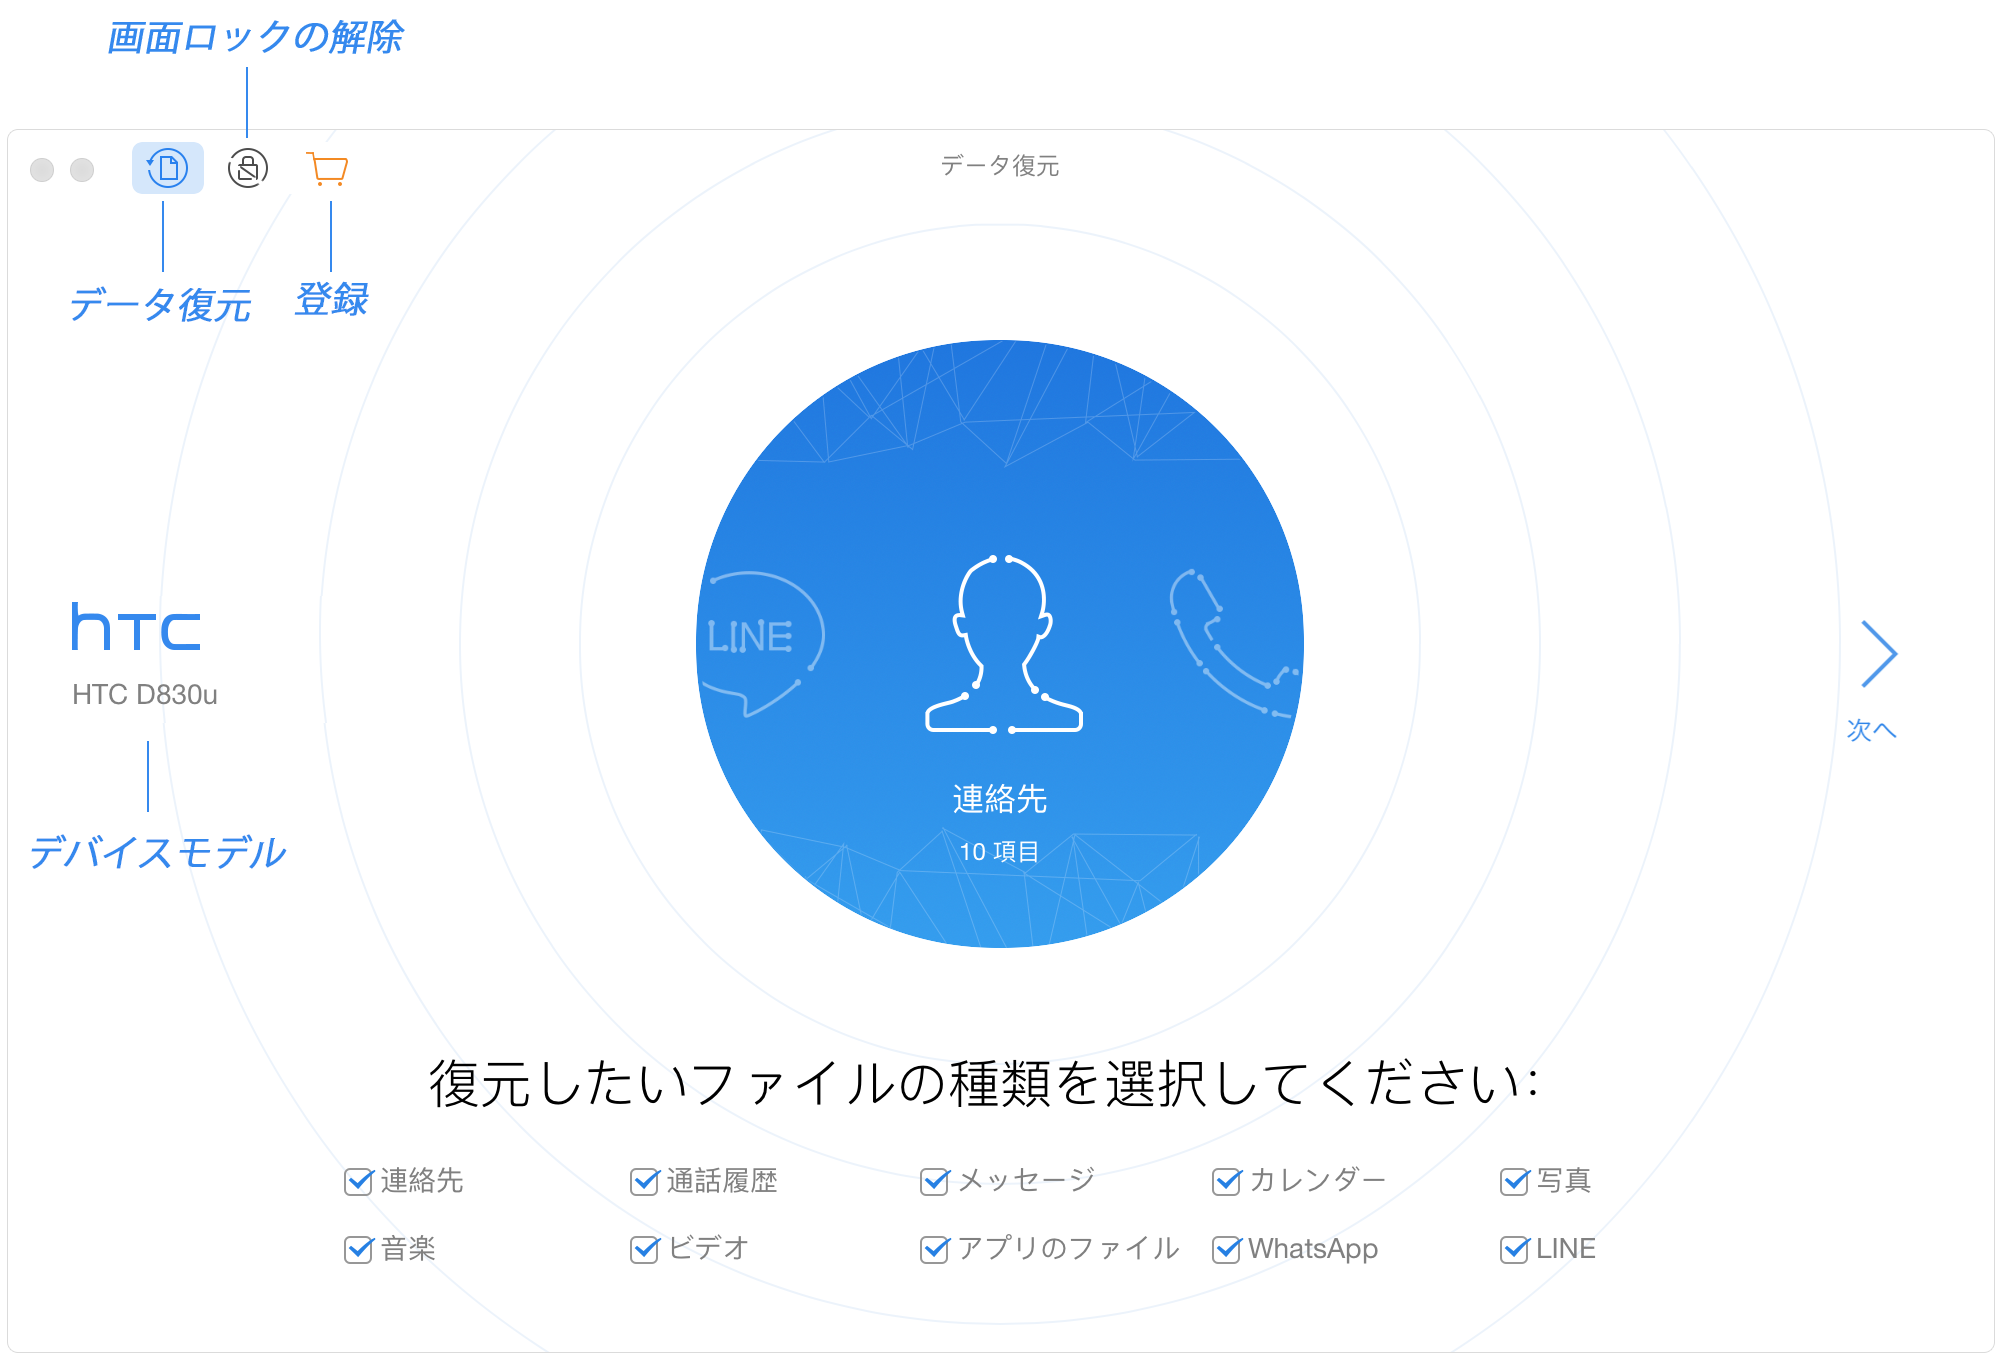 PhoneRescue for HTCのメインインターフェイス